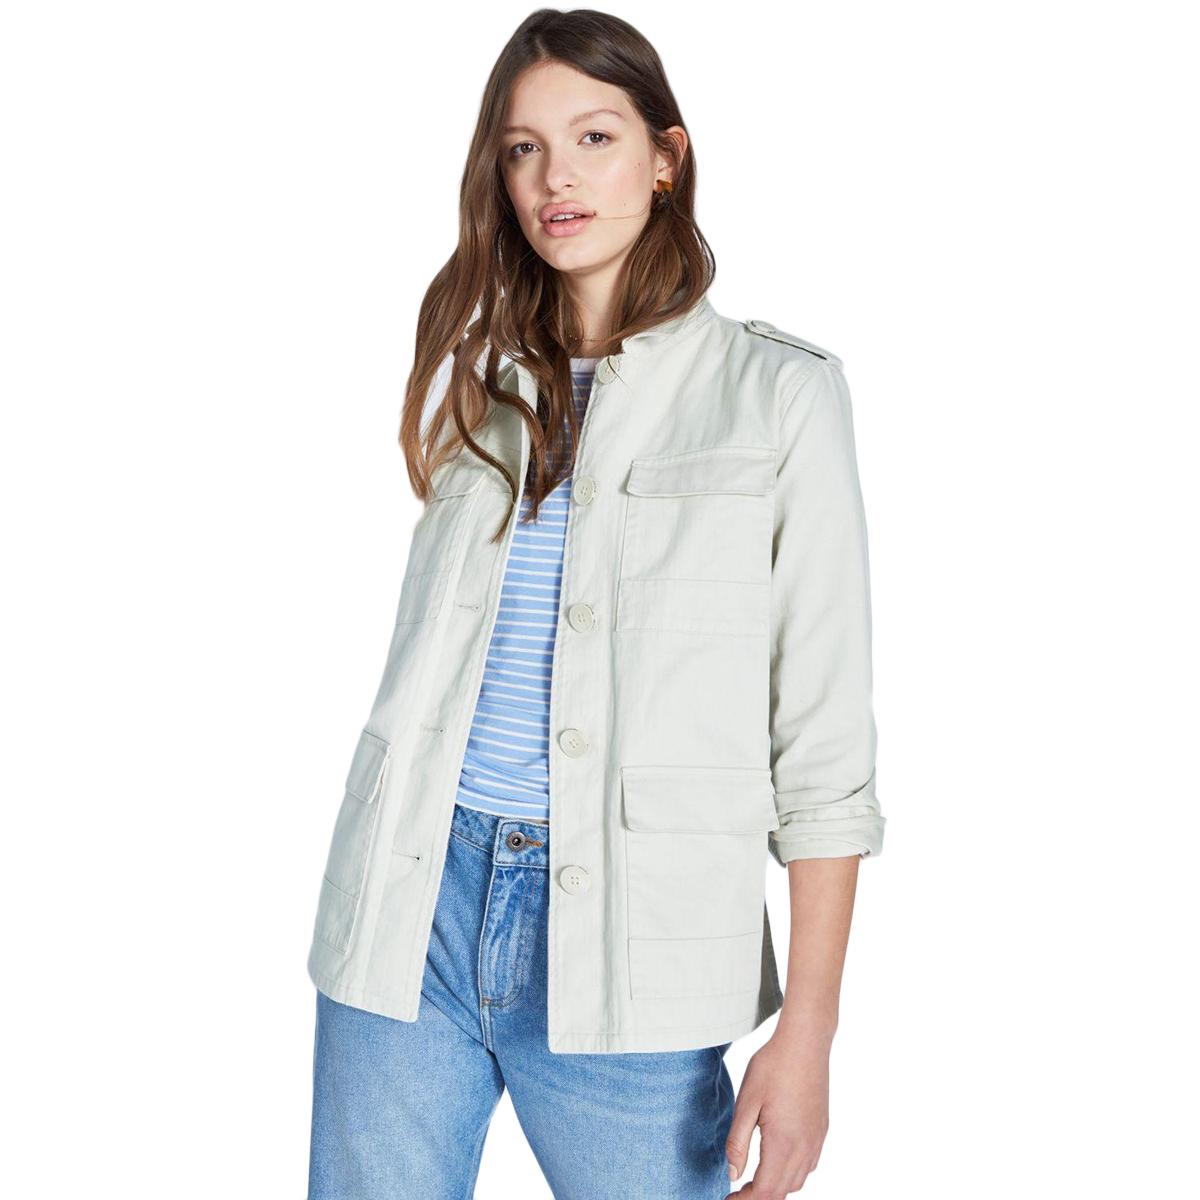 Jack Wills Women's Garrowby Utility Jacket - White, 10